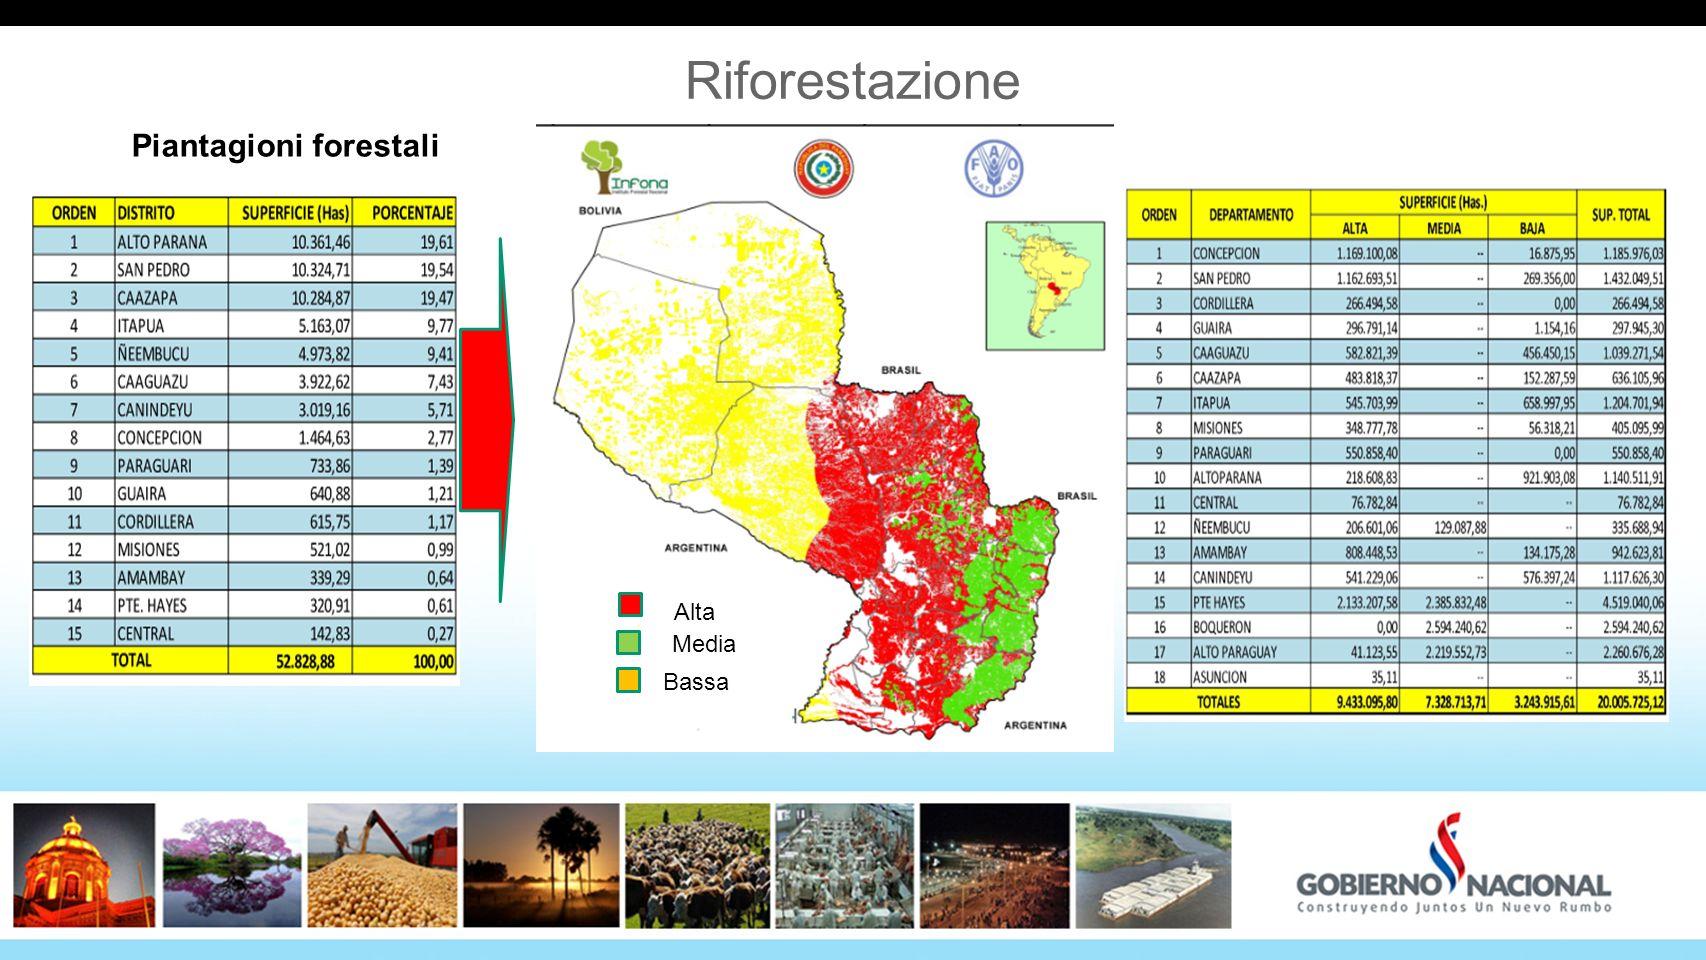 3434 Riforestazione Piantagioni forestali Alta Media Bassa 34